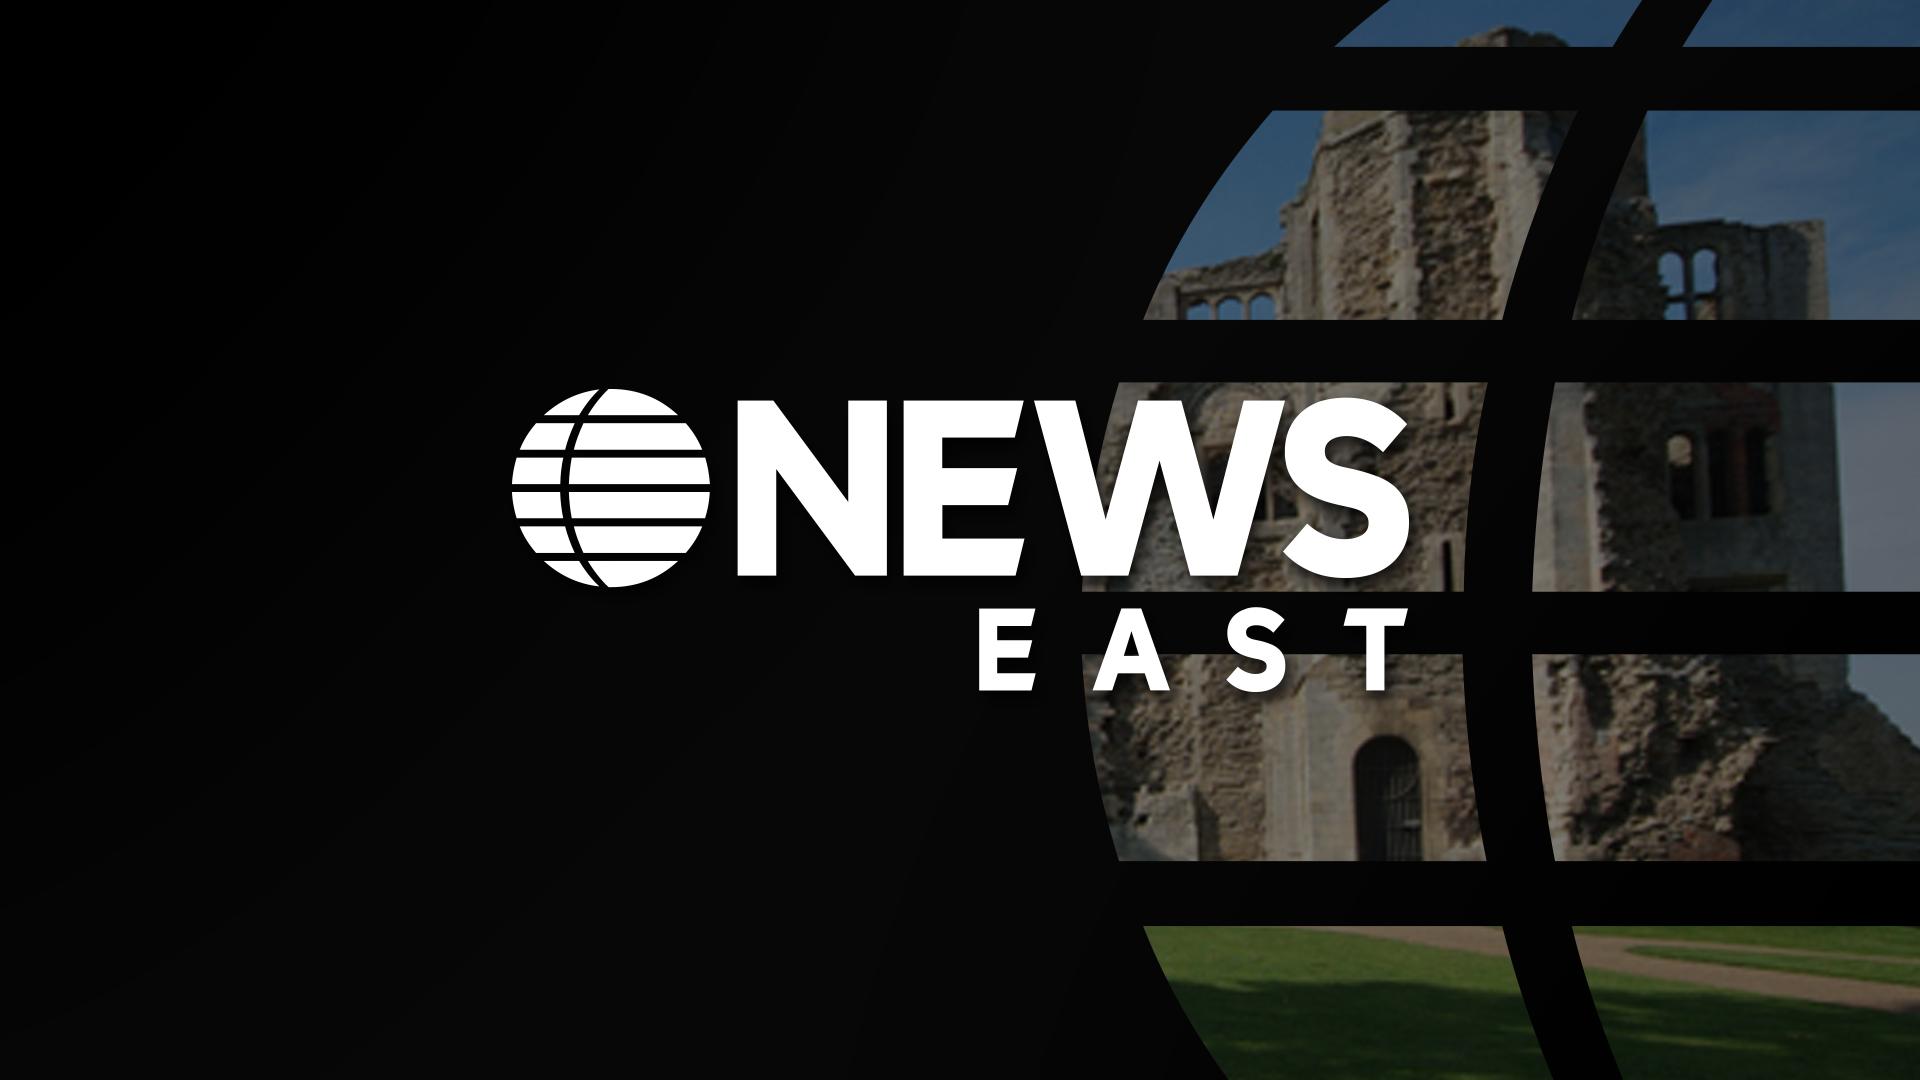 Centric News East